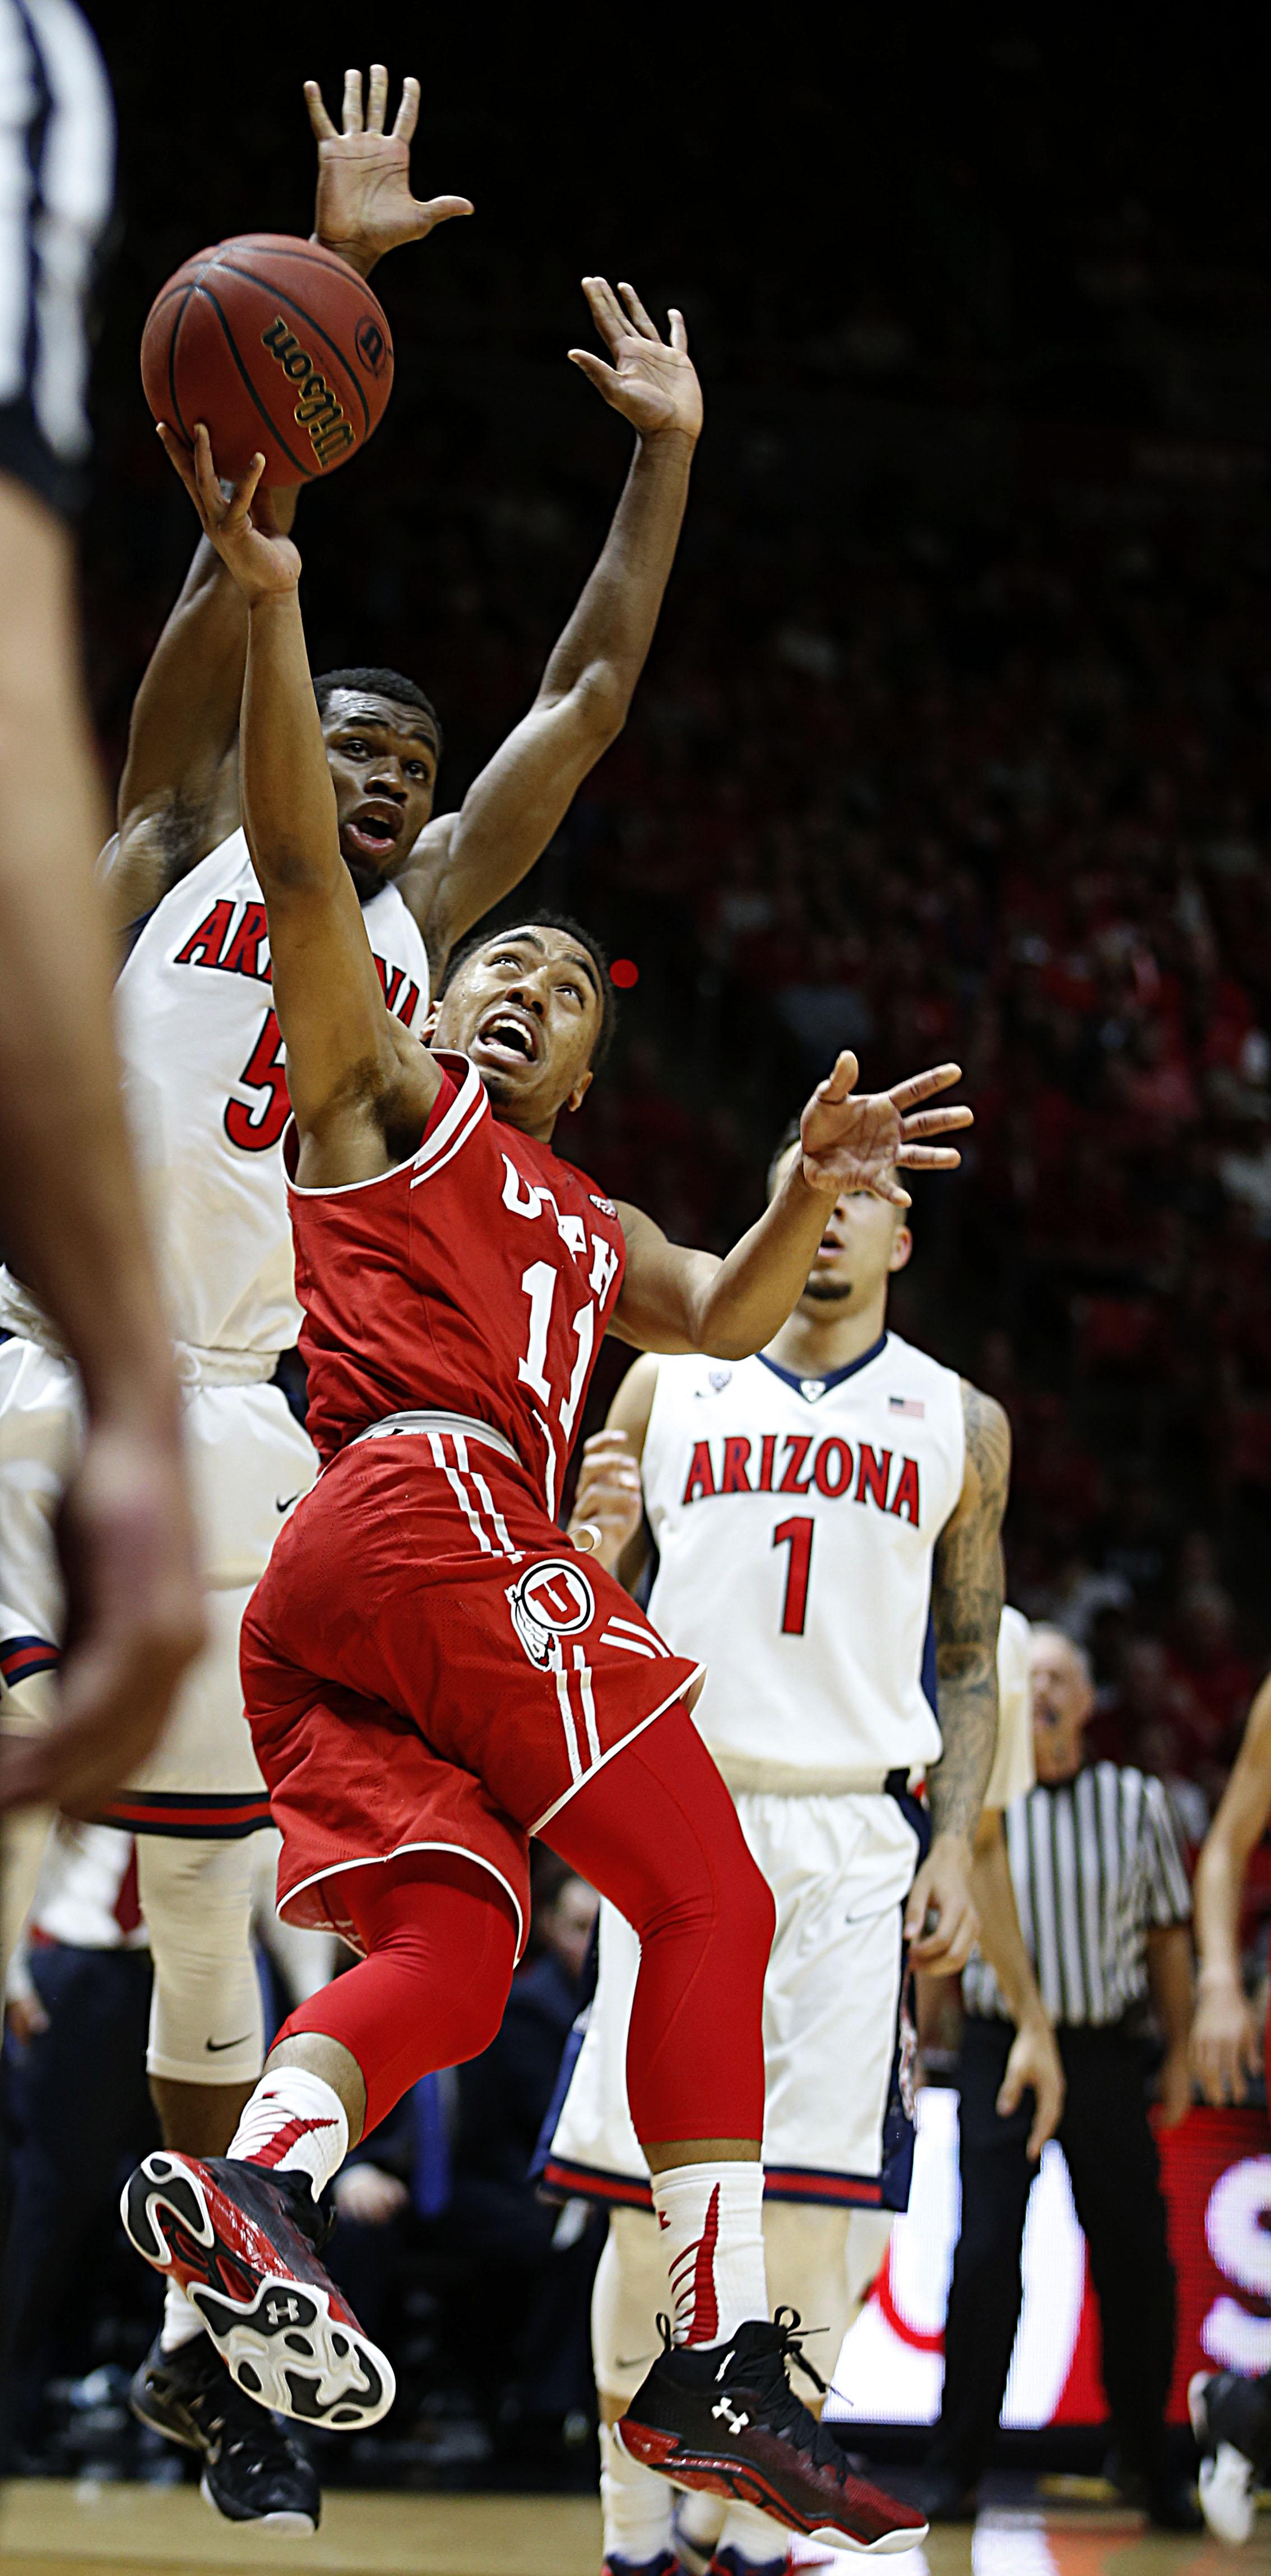 Utah guard Brandon Taylor (11) shoots past Arizona guard Kadeem Allen (5) during the first half of an NCAA college basketball game in Salt Lake City, Saturday, Feb. 27, 2016. (AP Photo/George Frey)